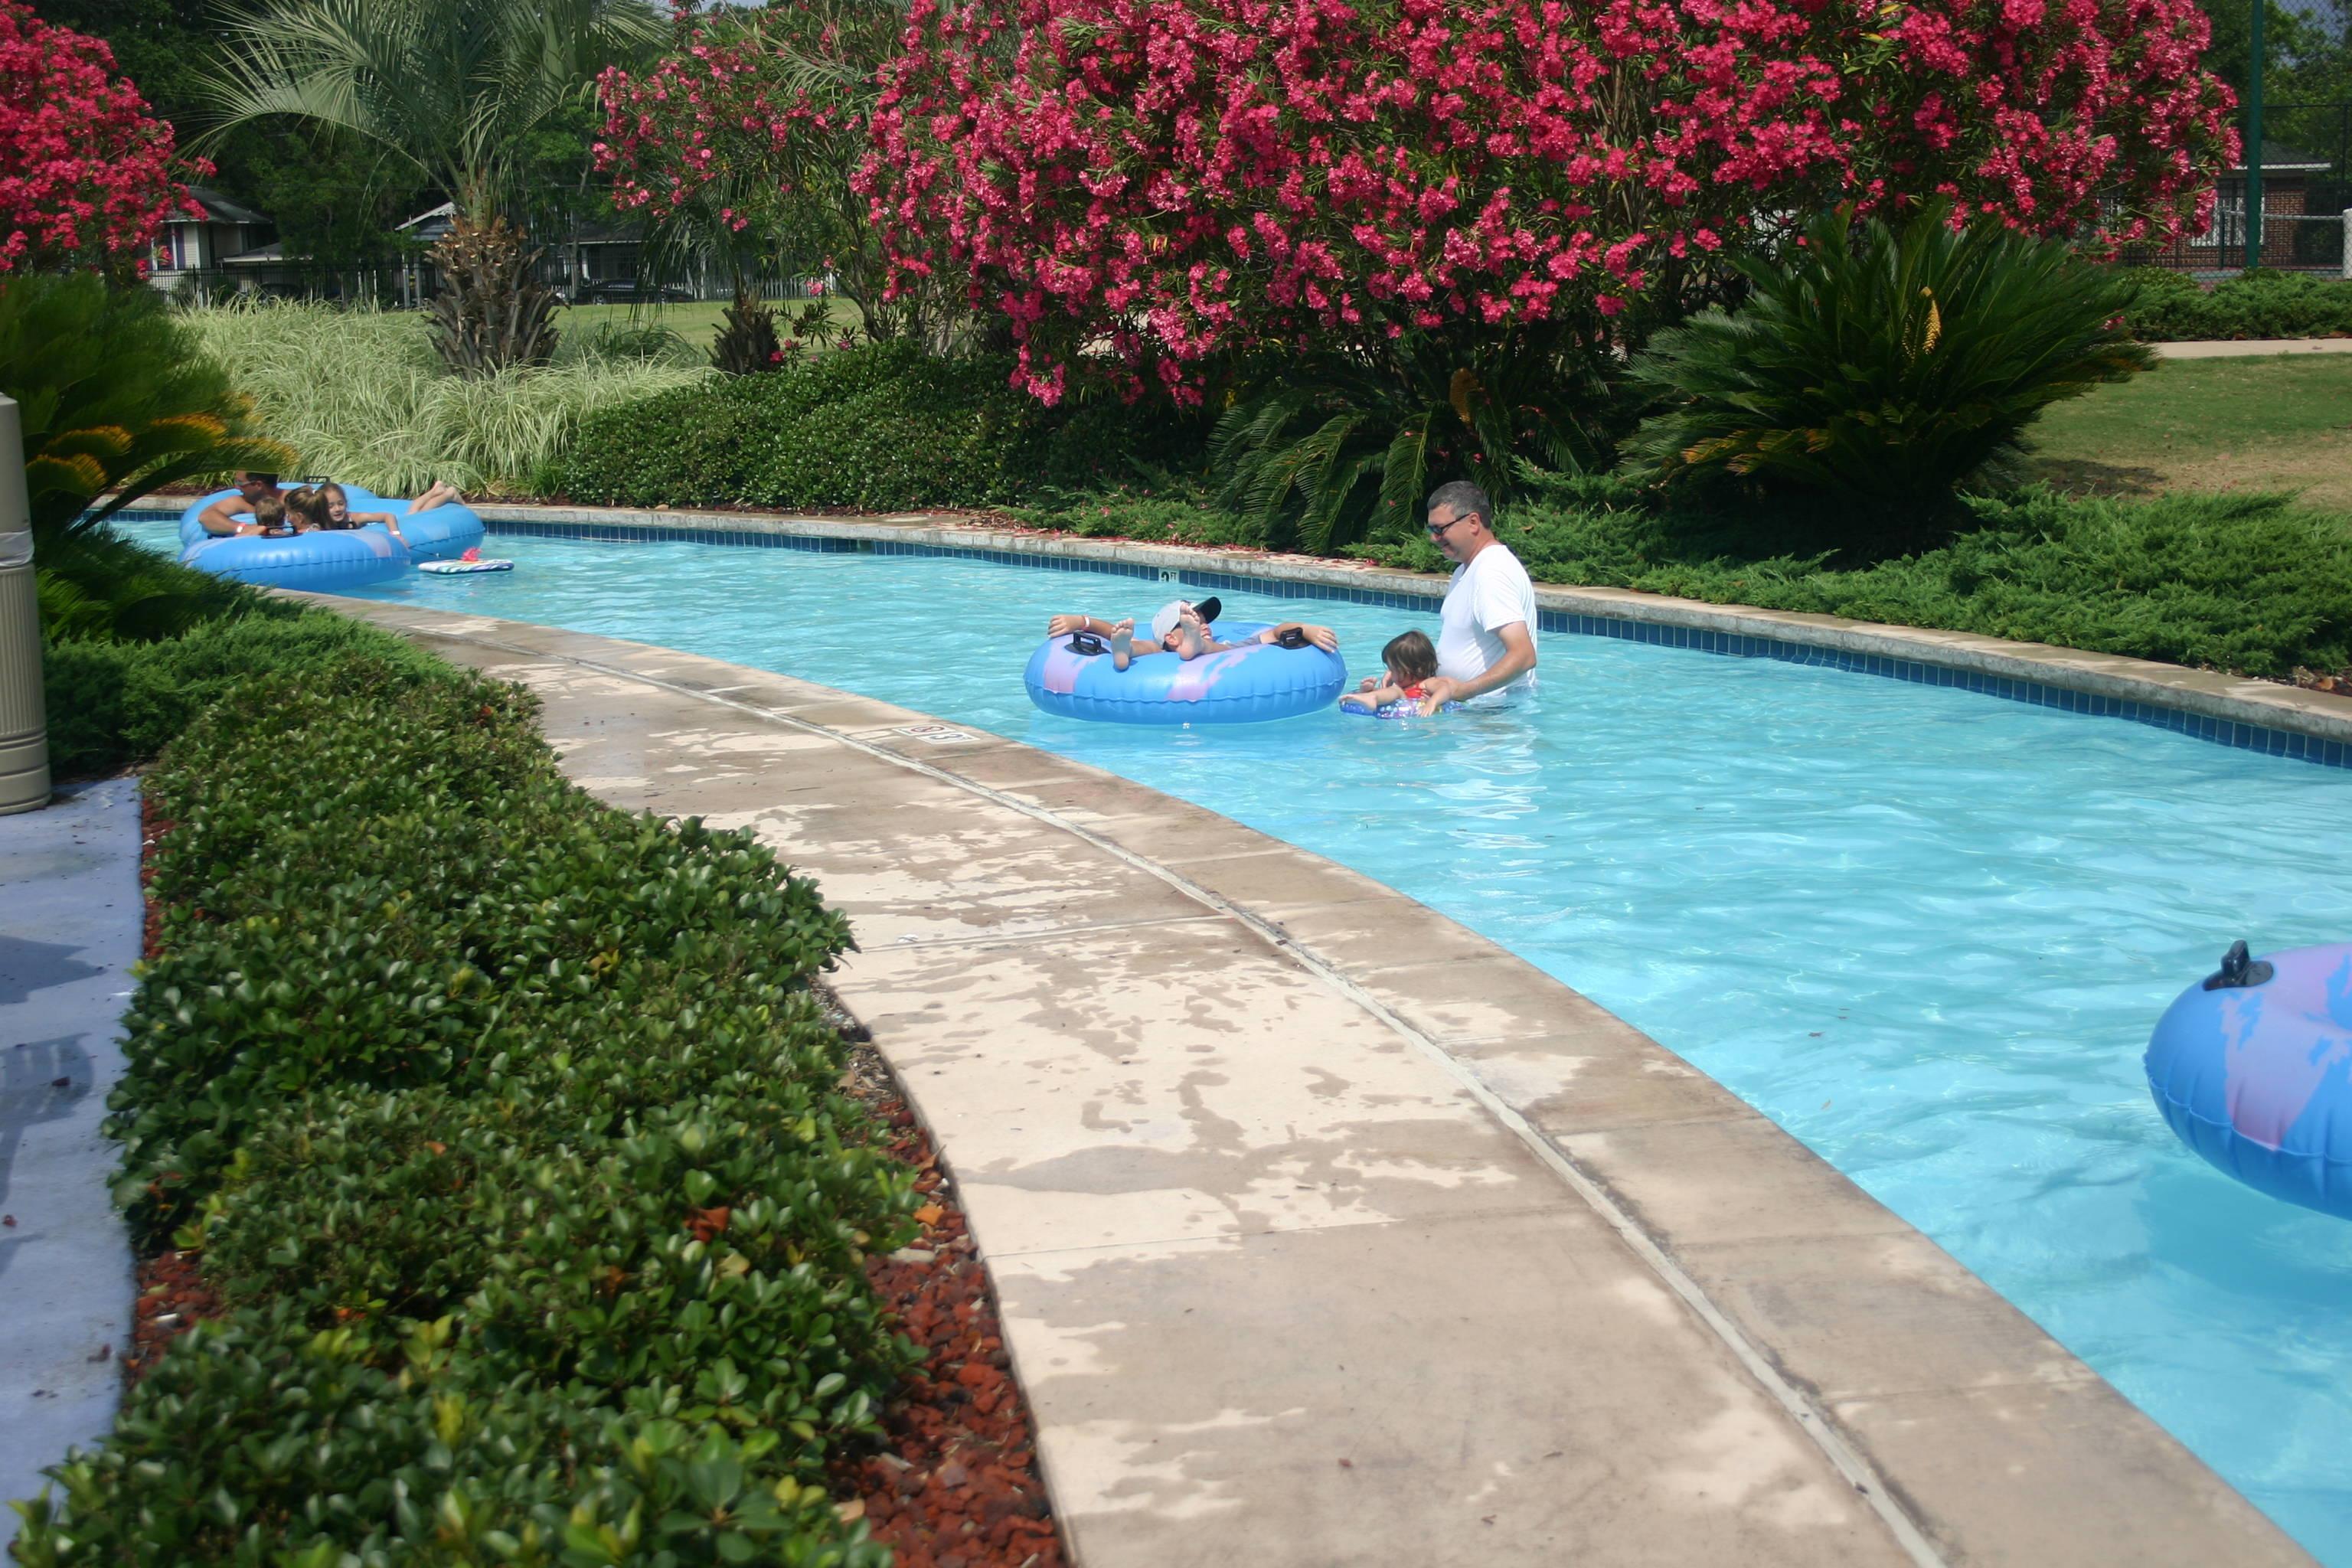 Piscina agua salada free fotos de piscina agua salada - Piscina agua salada ...